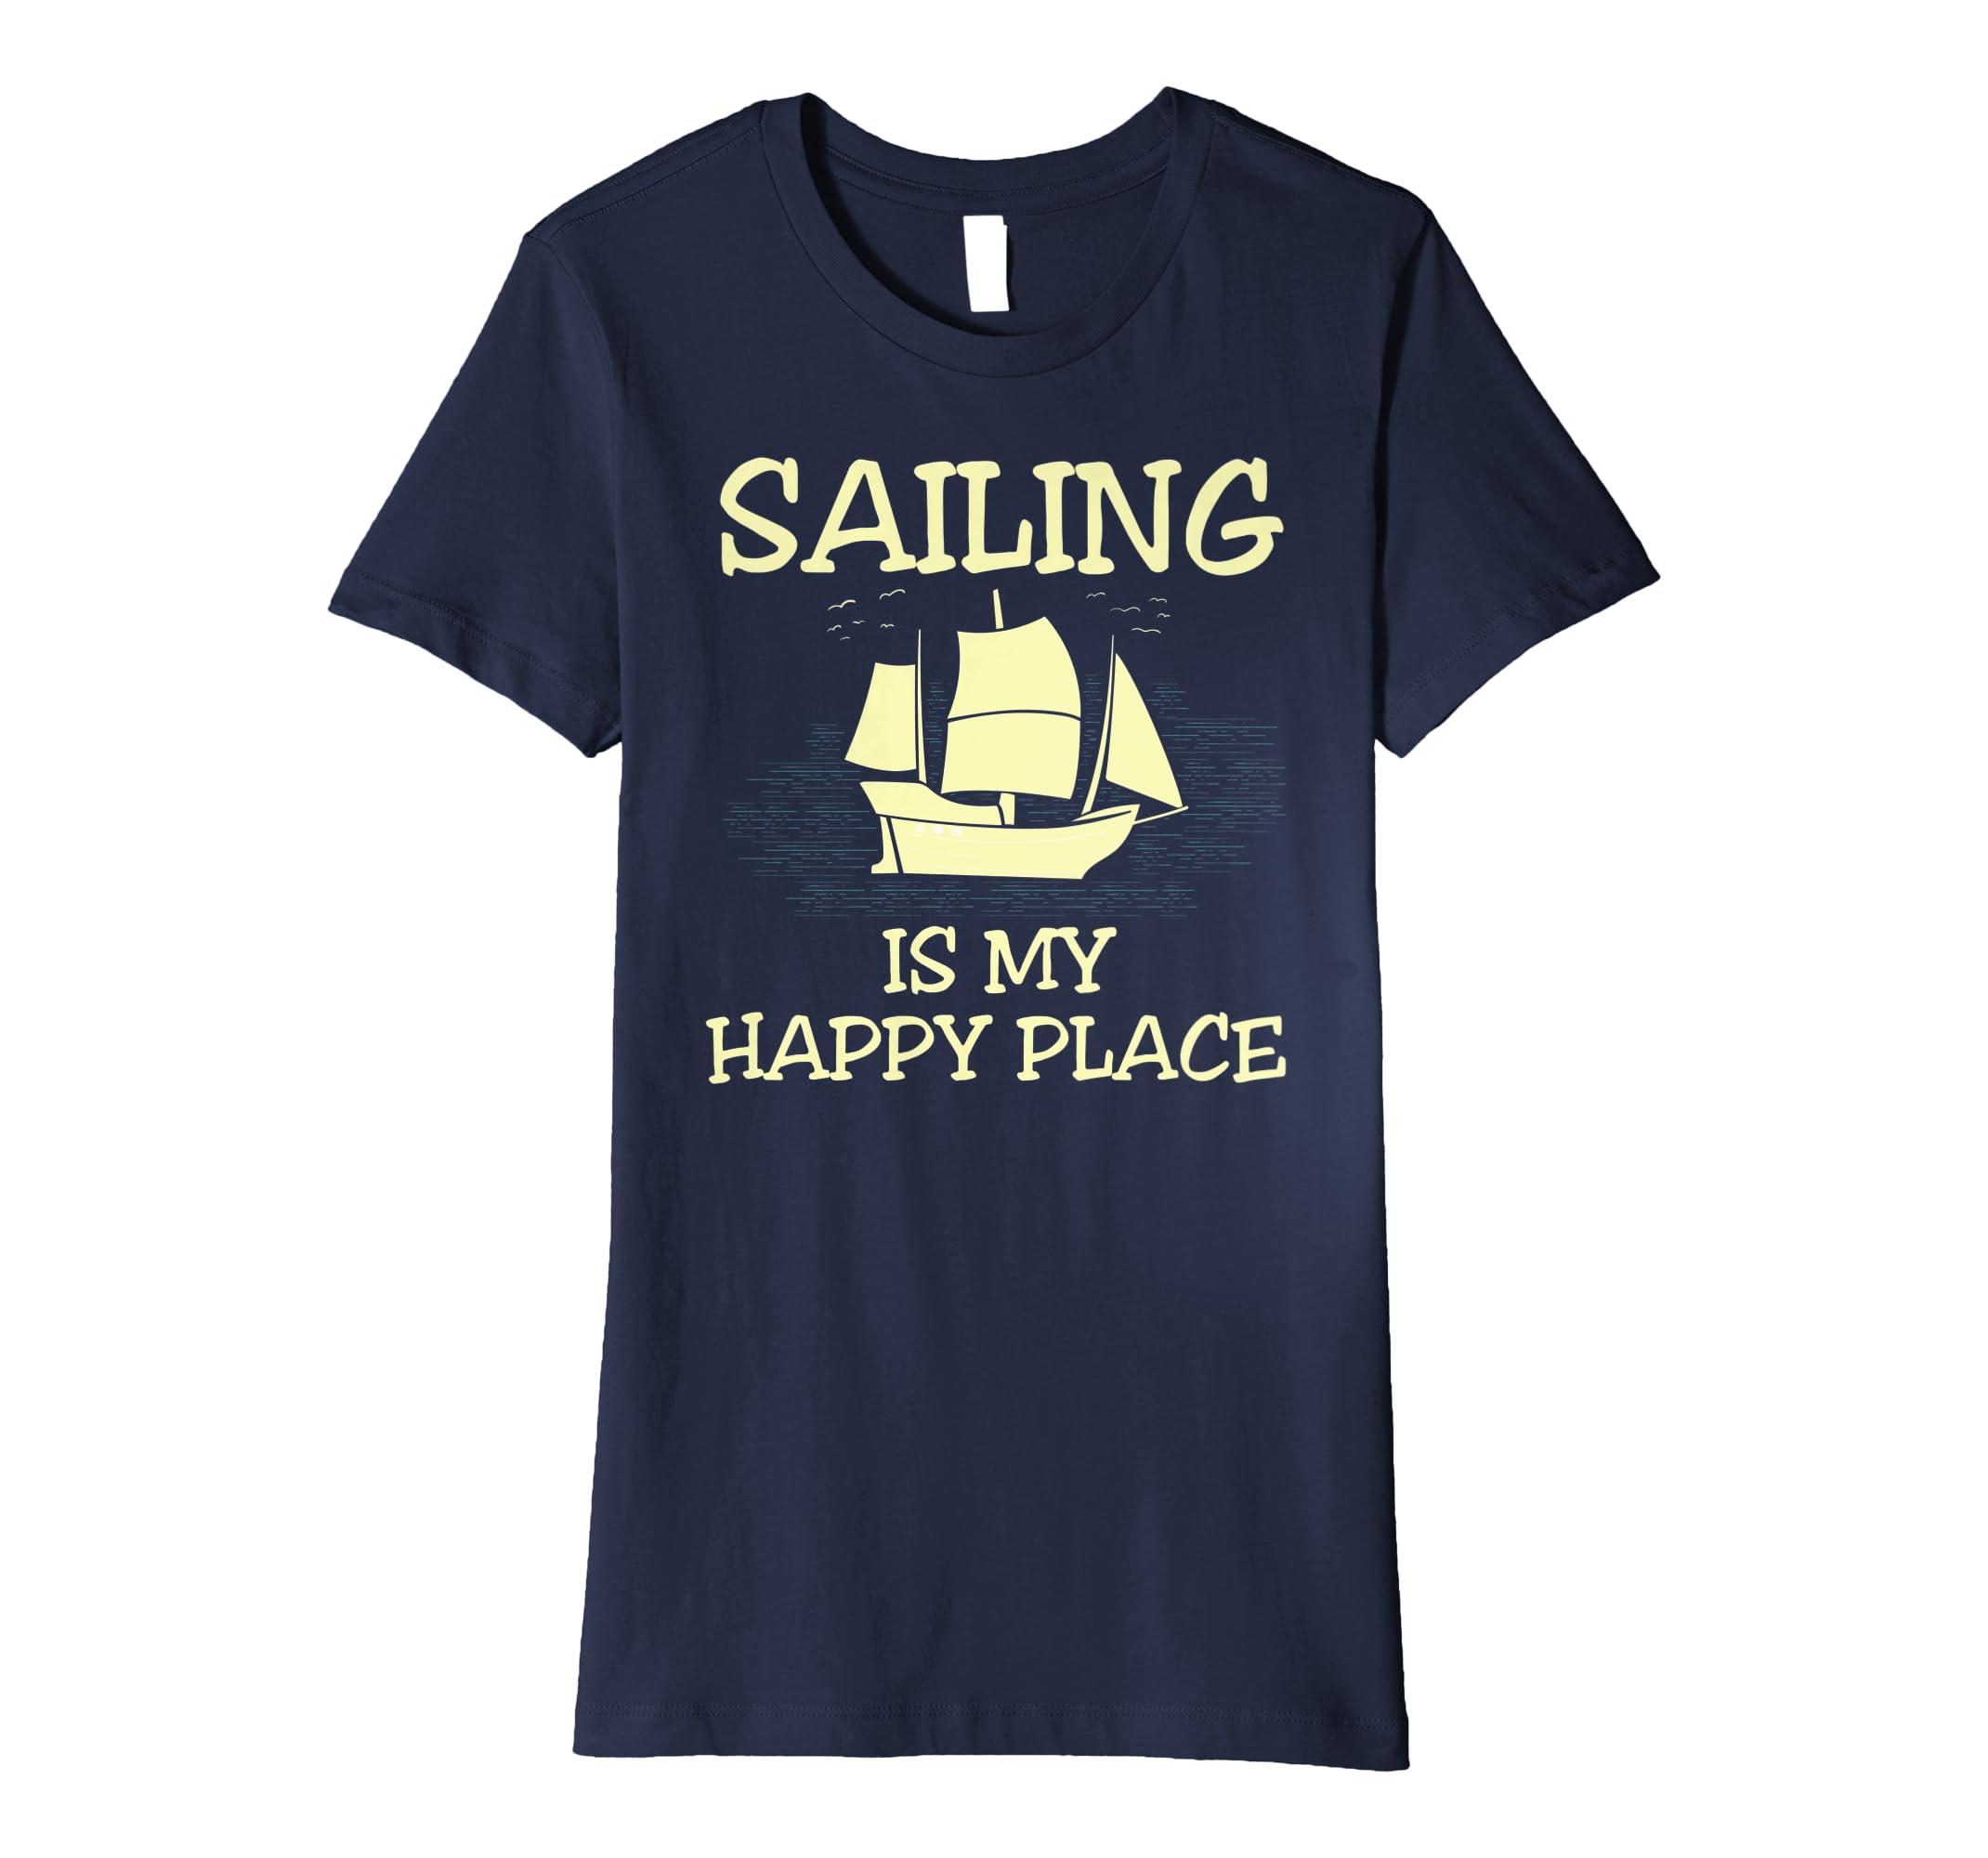 e2592618a6e8 Amazon.com: Sailing Shirt My Happy Place Tees Sailor Men Women Sail Gift:  Clothing